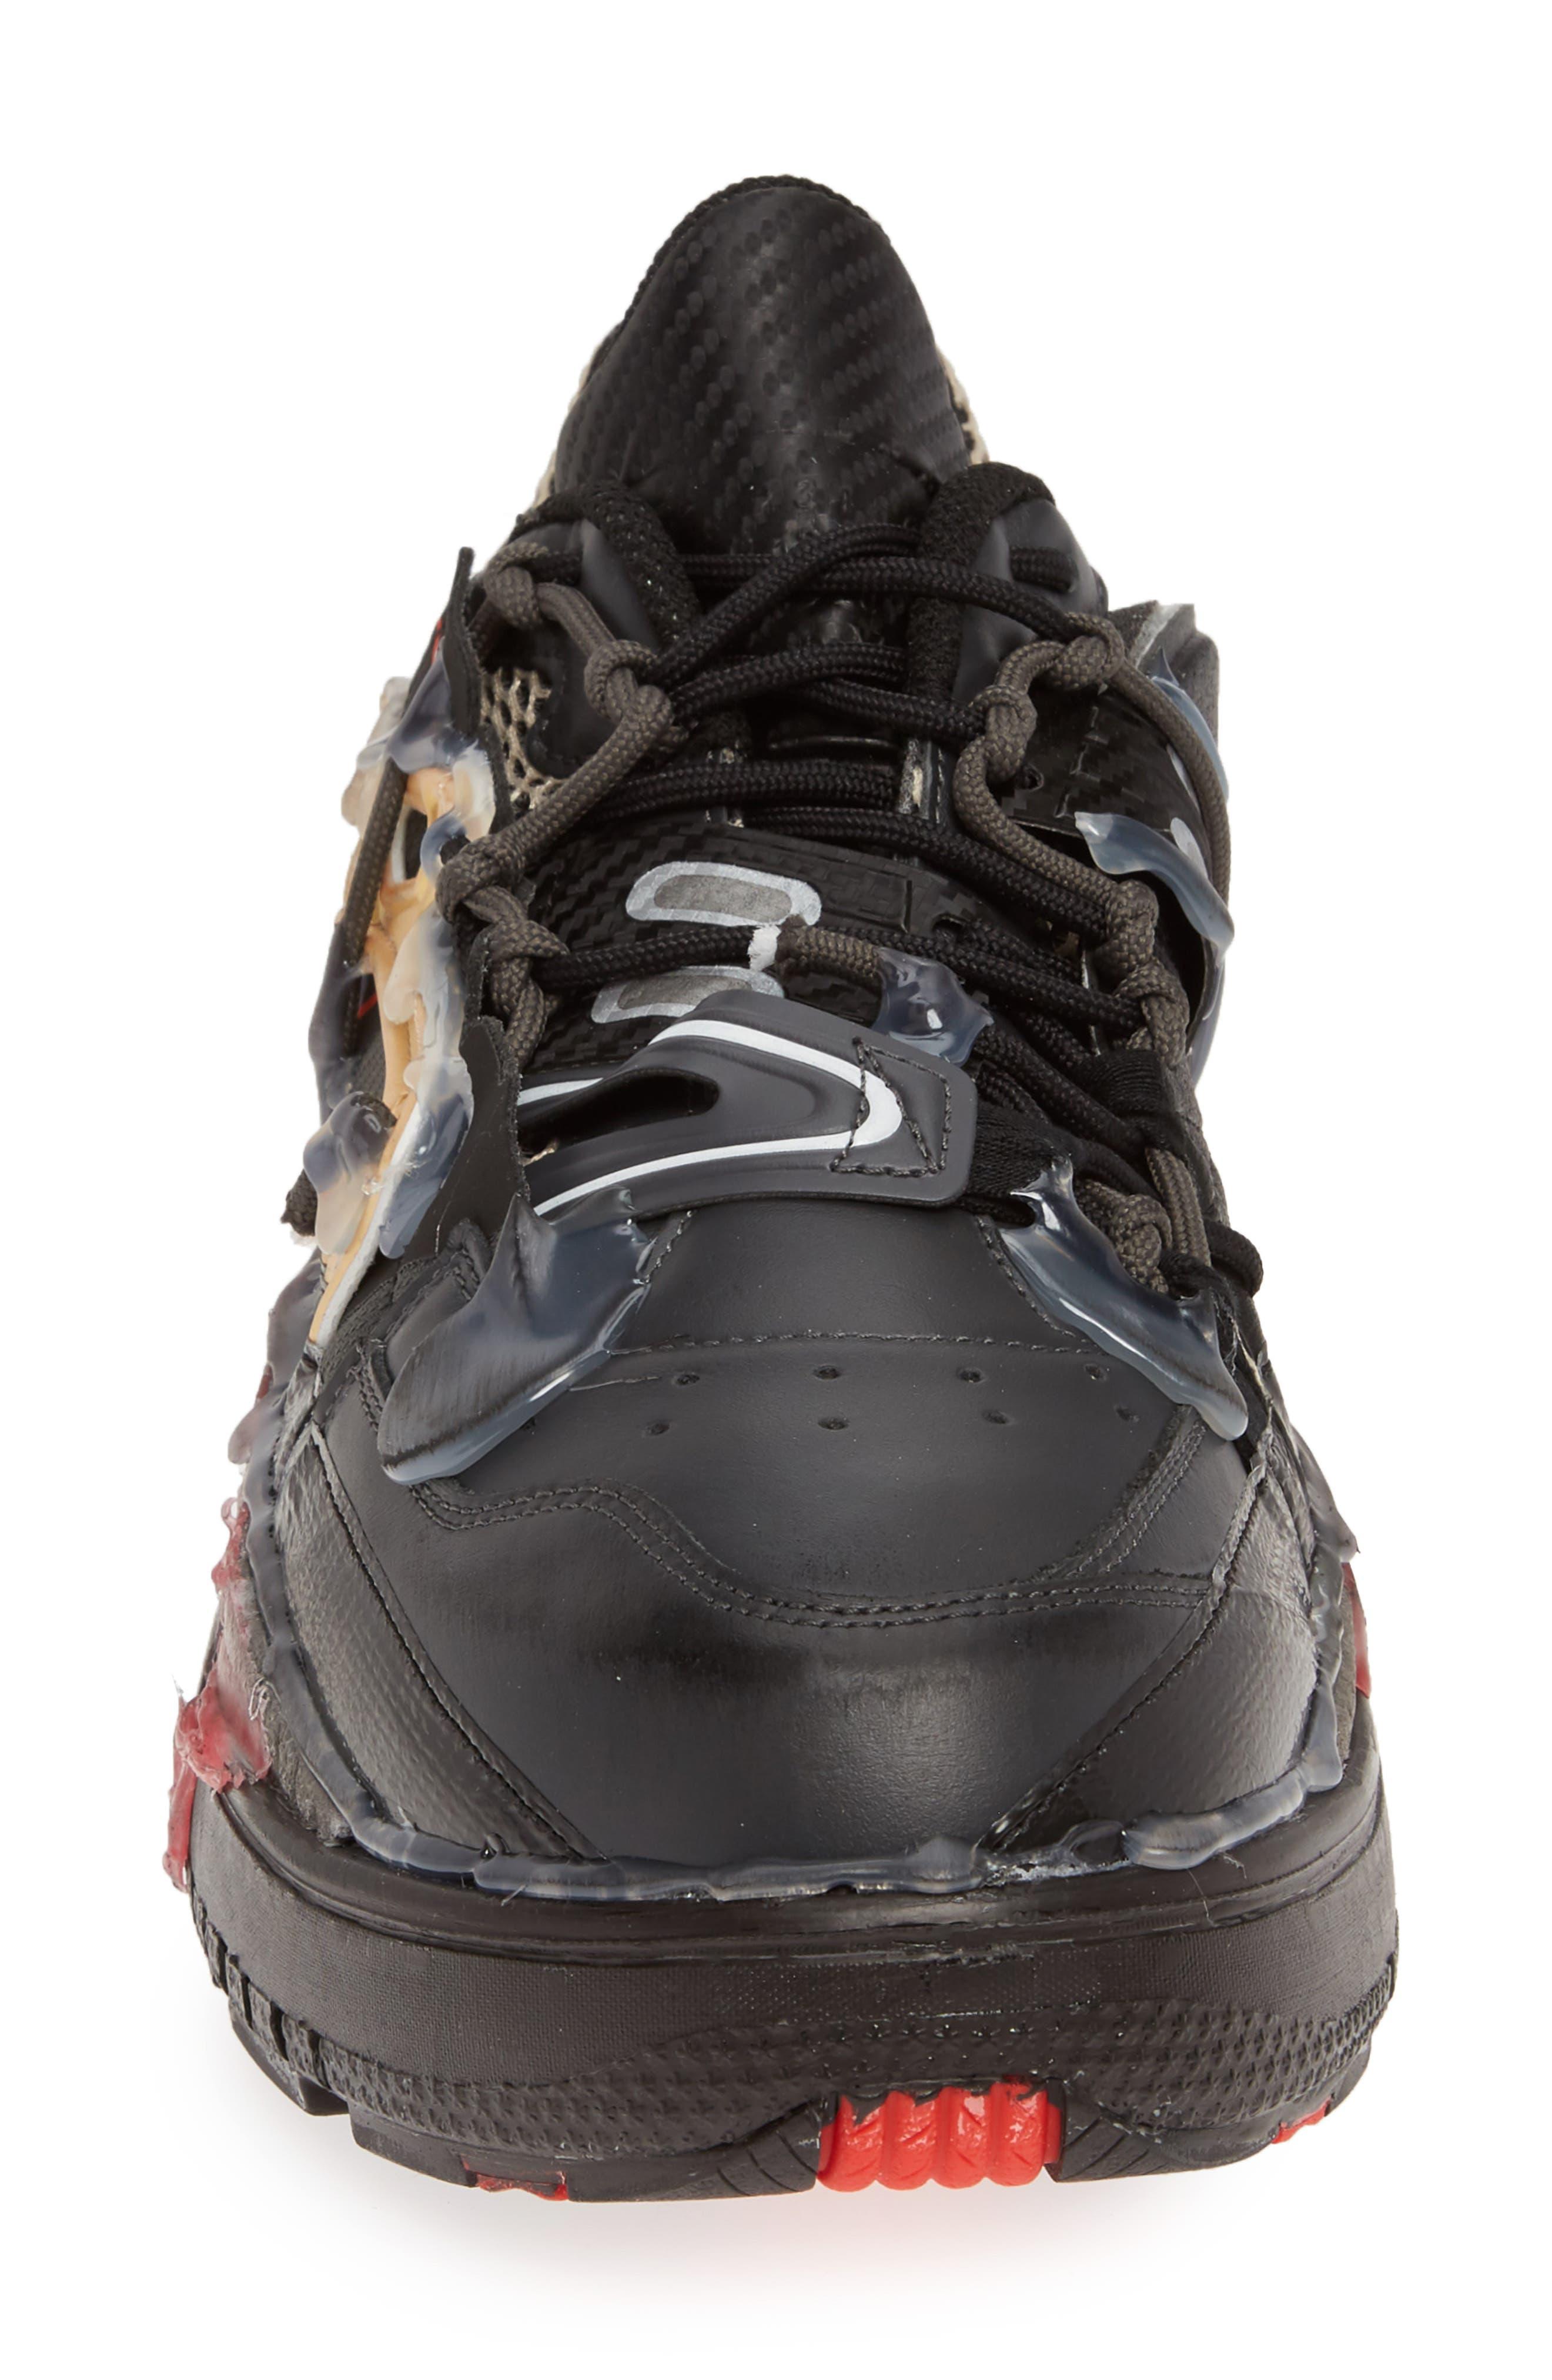 MM6 MAISON MARGIELA,                             Maison Margiela Fusion Sneaker,                             Alternate thumbnail 4, color,                             BLACK/ GOLD/ RED